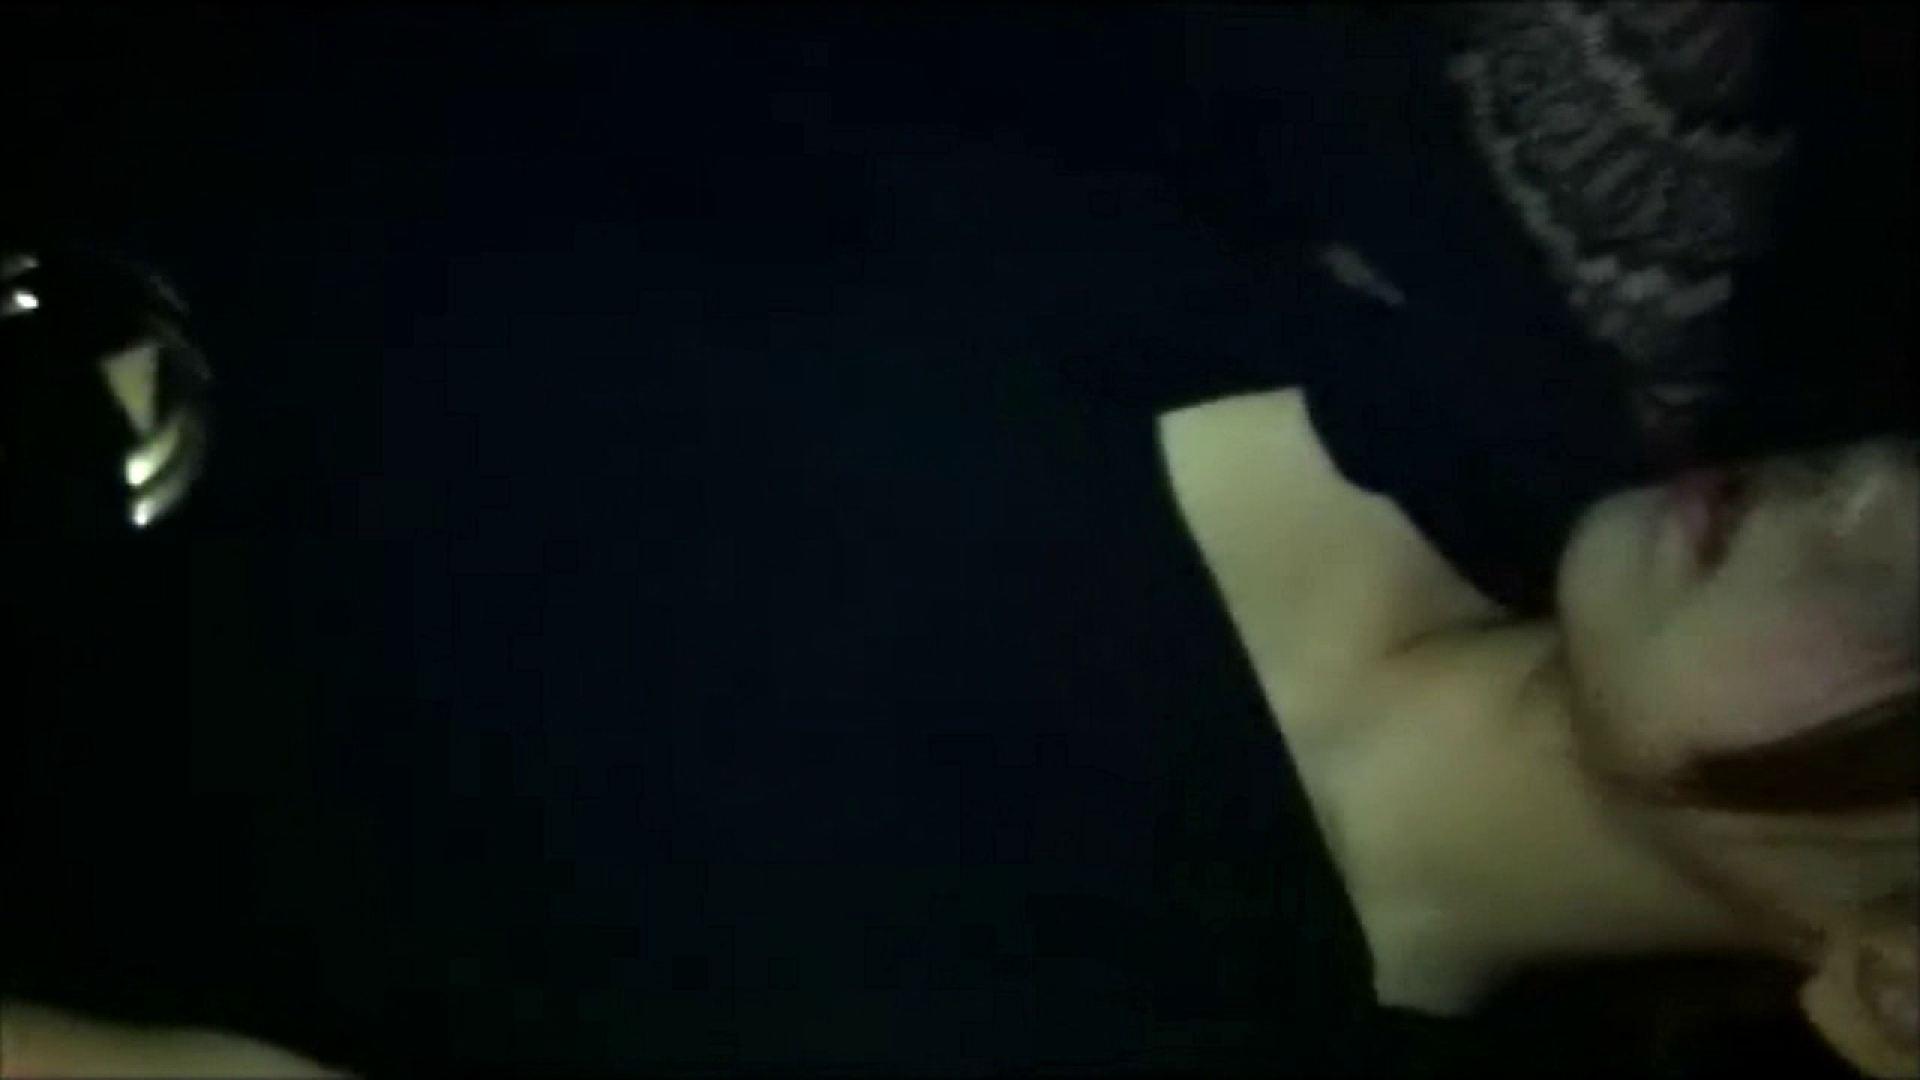 vol.5 【Nちゃん】某百貨店化粧品コーナー店員21歳 恋愛には至らず パンチラ女子 | いじくり  108枚 1